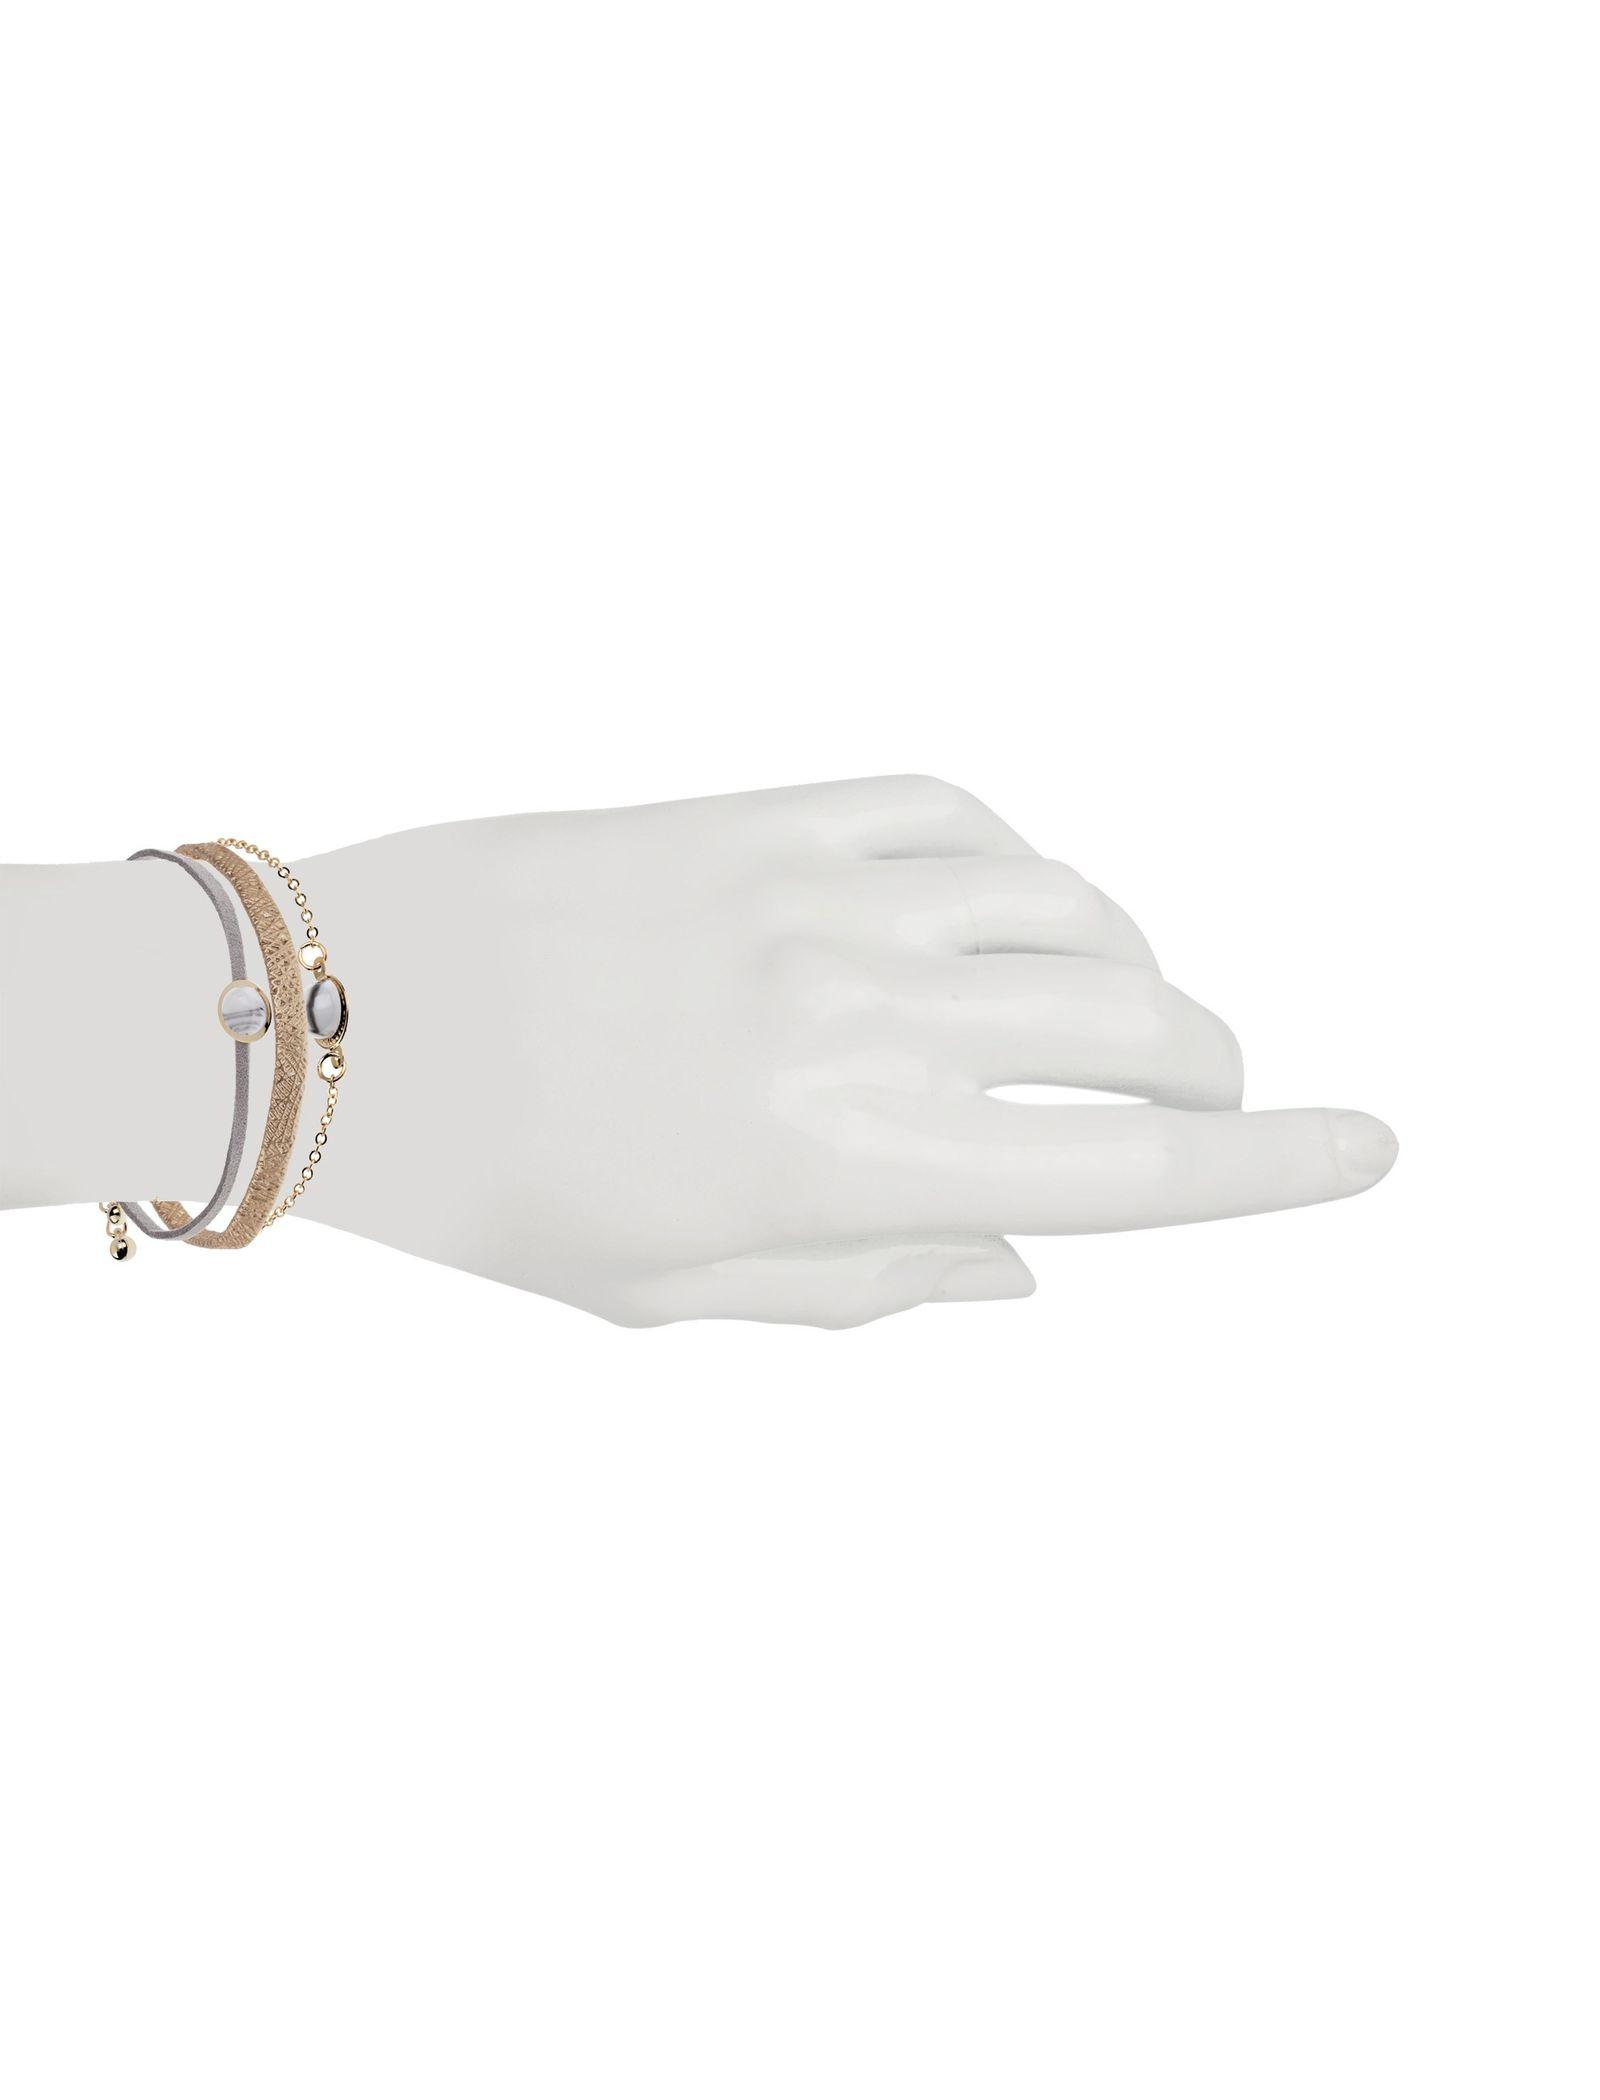 دستبند زنانه بسته 3 عددی - کوتون - طلايي/ طوسي - 14